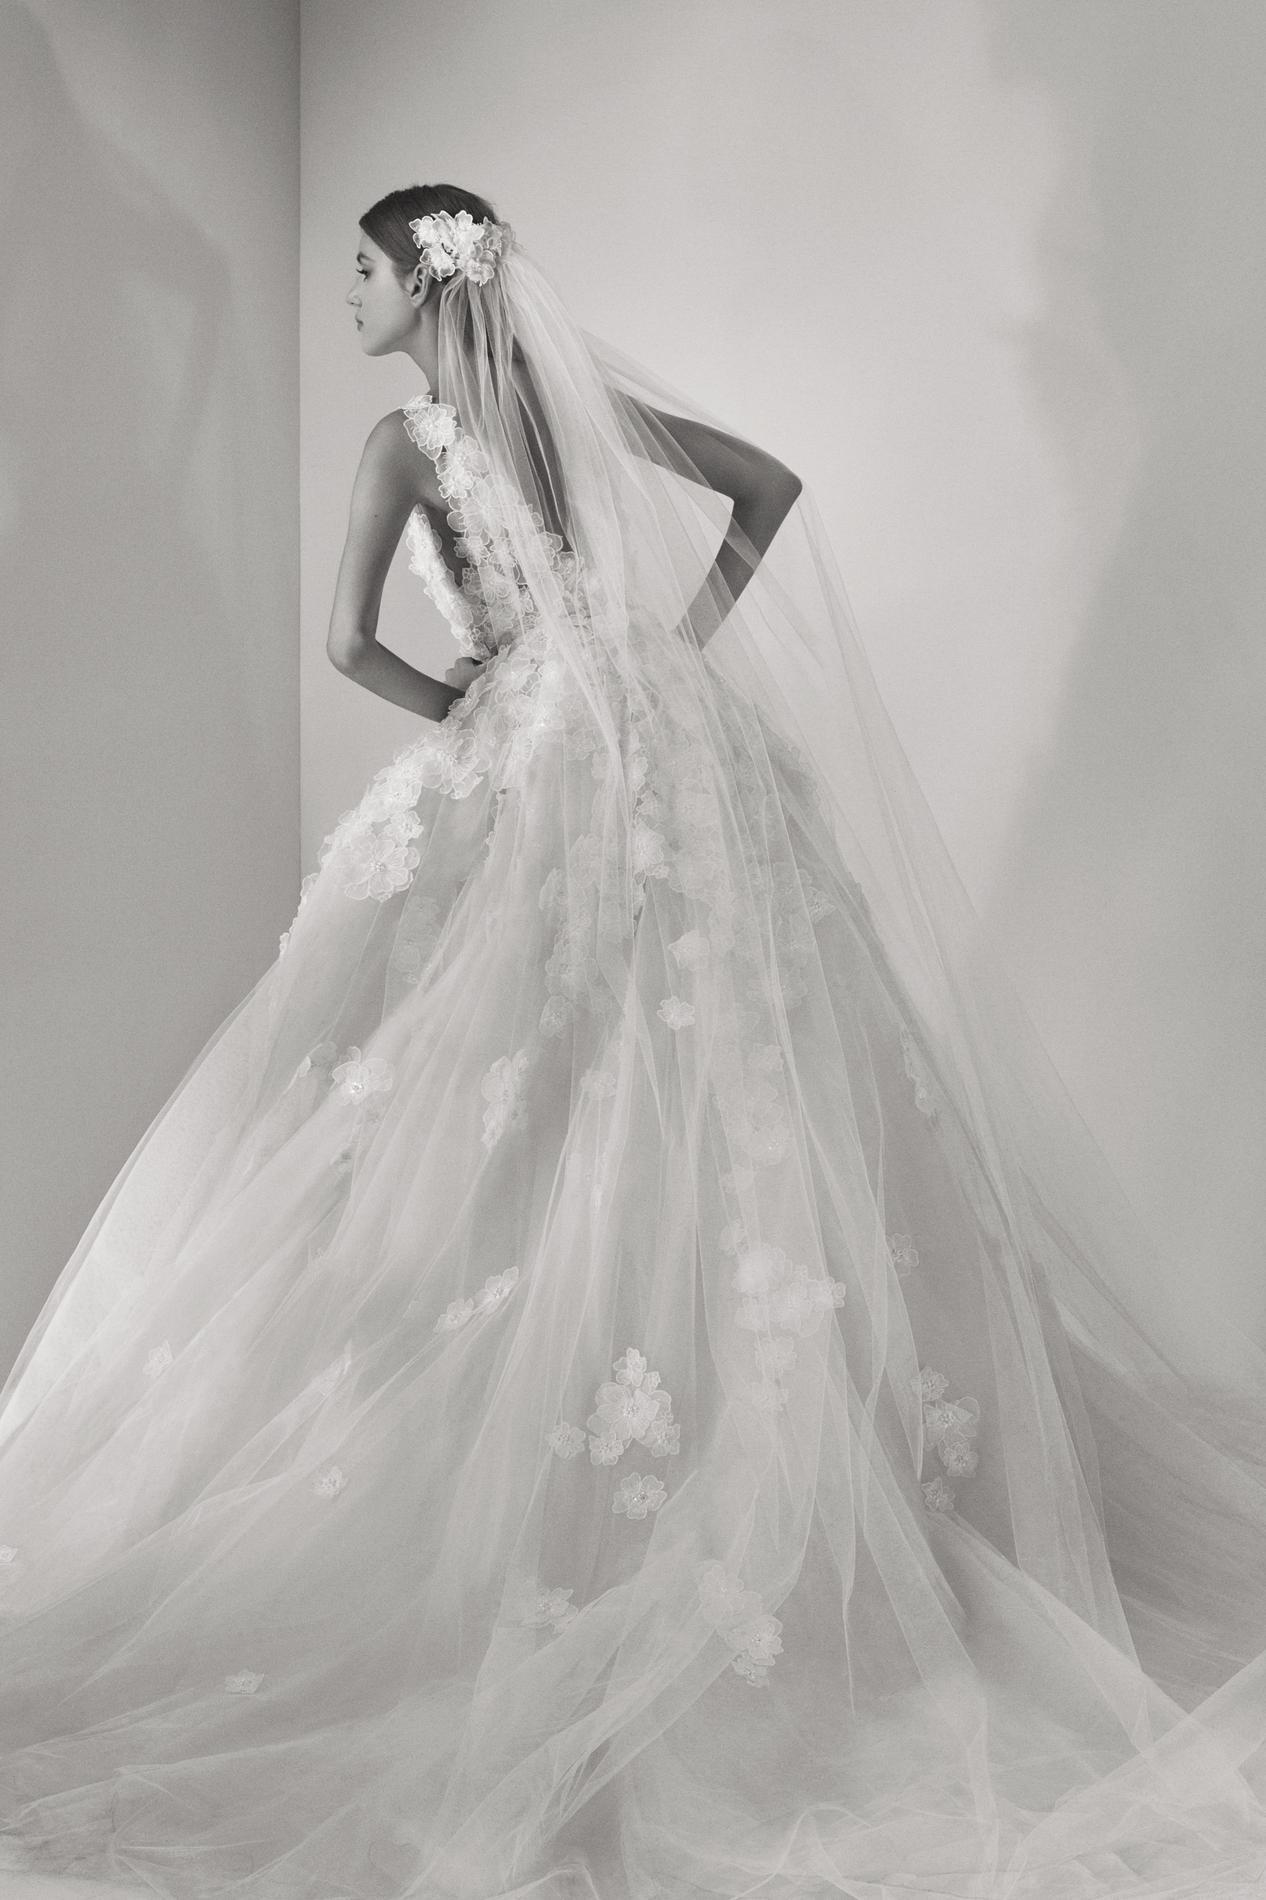 3a9258505a7 ... Elie Saab Bridal automne 2017 Elie Saab Bridal automne 2017 Les  collections de robes de mariée 2017   La robe Enamorada de Sessun Oui!